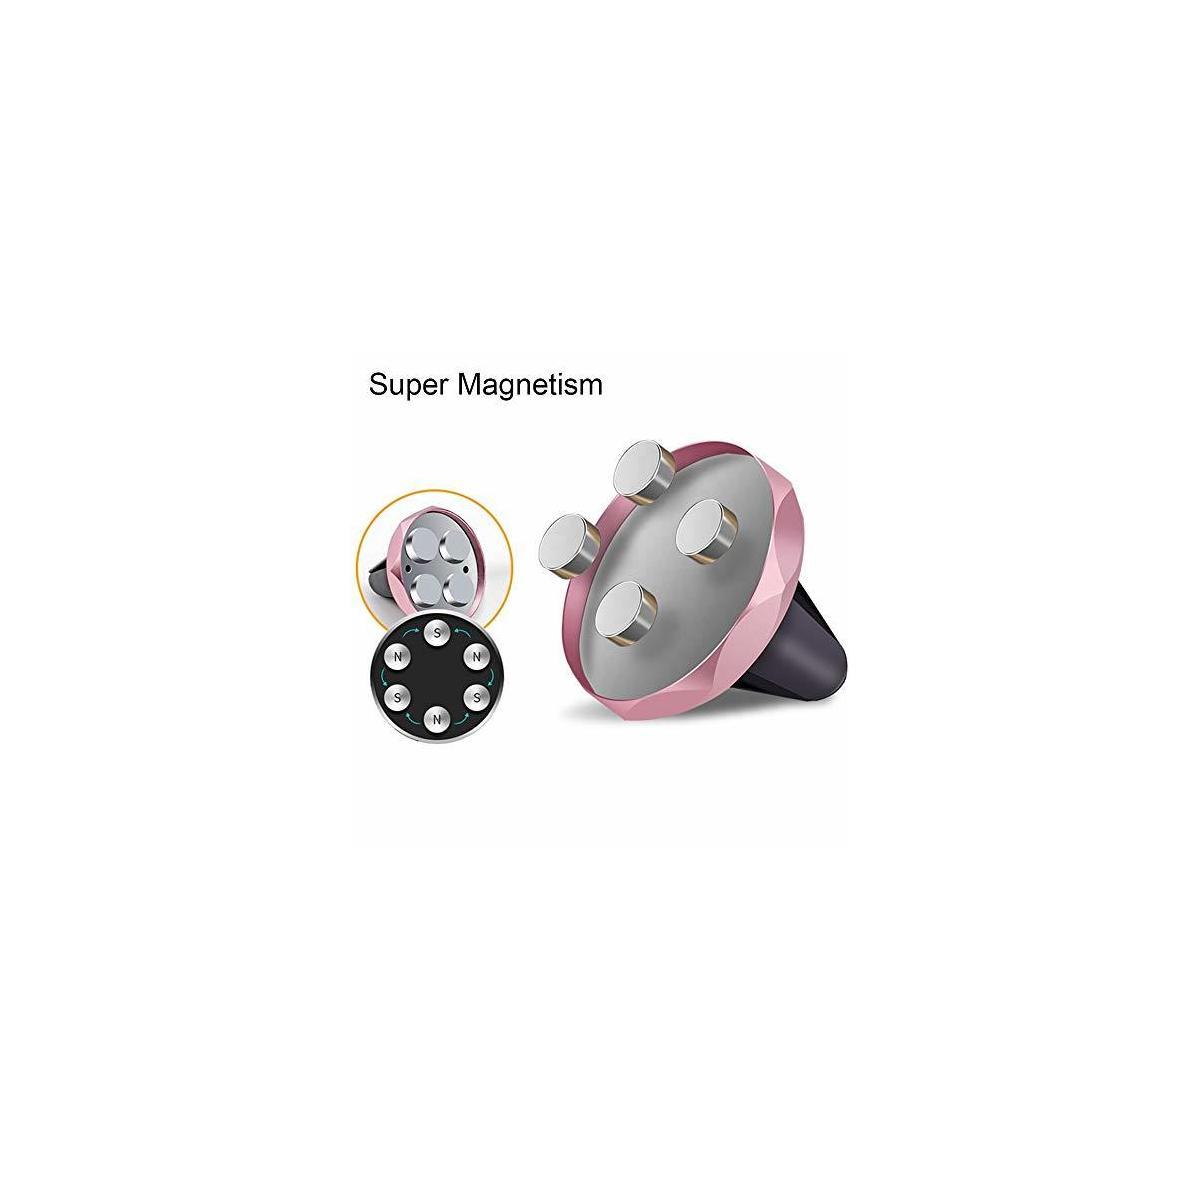 TeknoShop Magnetic Car Phone Mount, 360° Rotation Cell Phone 3-Colors (1-Unit) Super Strong Holder, Minimalist Design, Compatible With All Smartphones (Big Phones) Mini Tablet (Compatible Most Case)